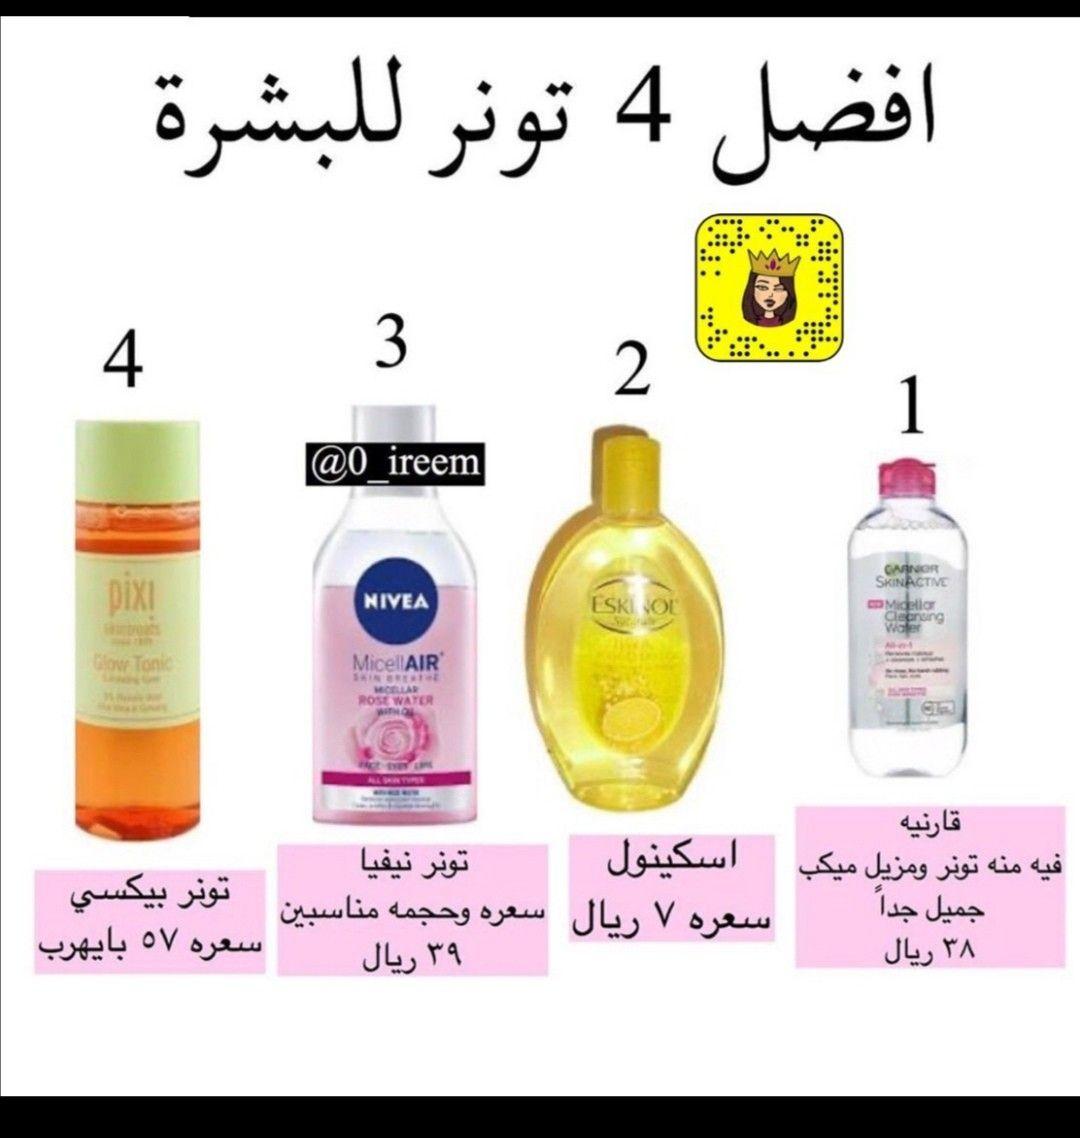 Pin By سبحان الله On خلطاااات Hand Soap Bottle Soap Bottle Hand Soap